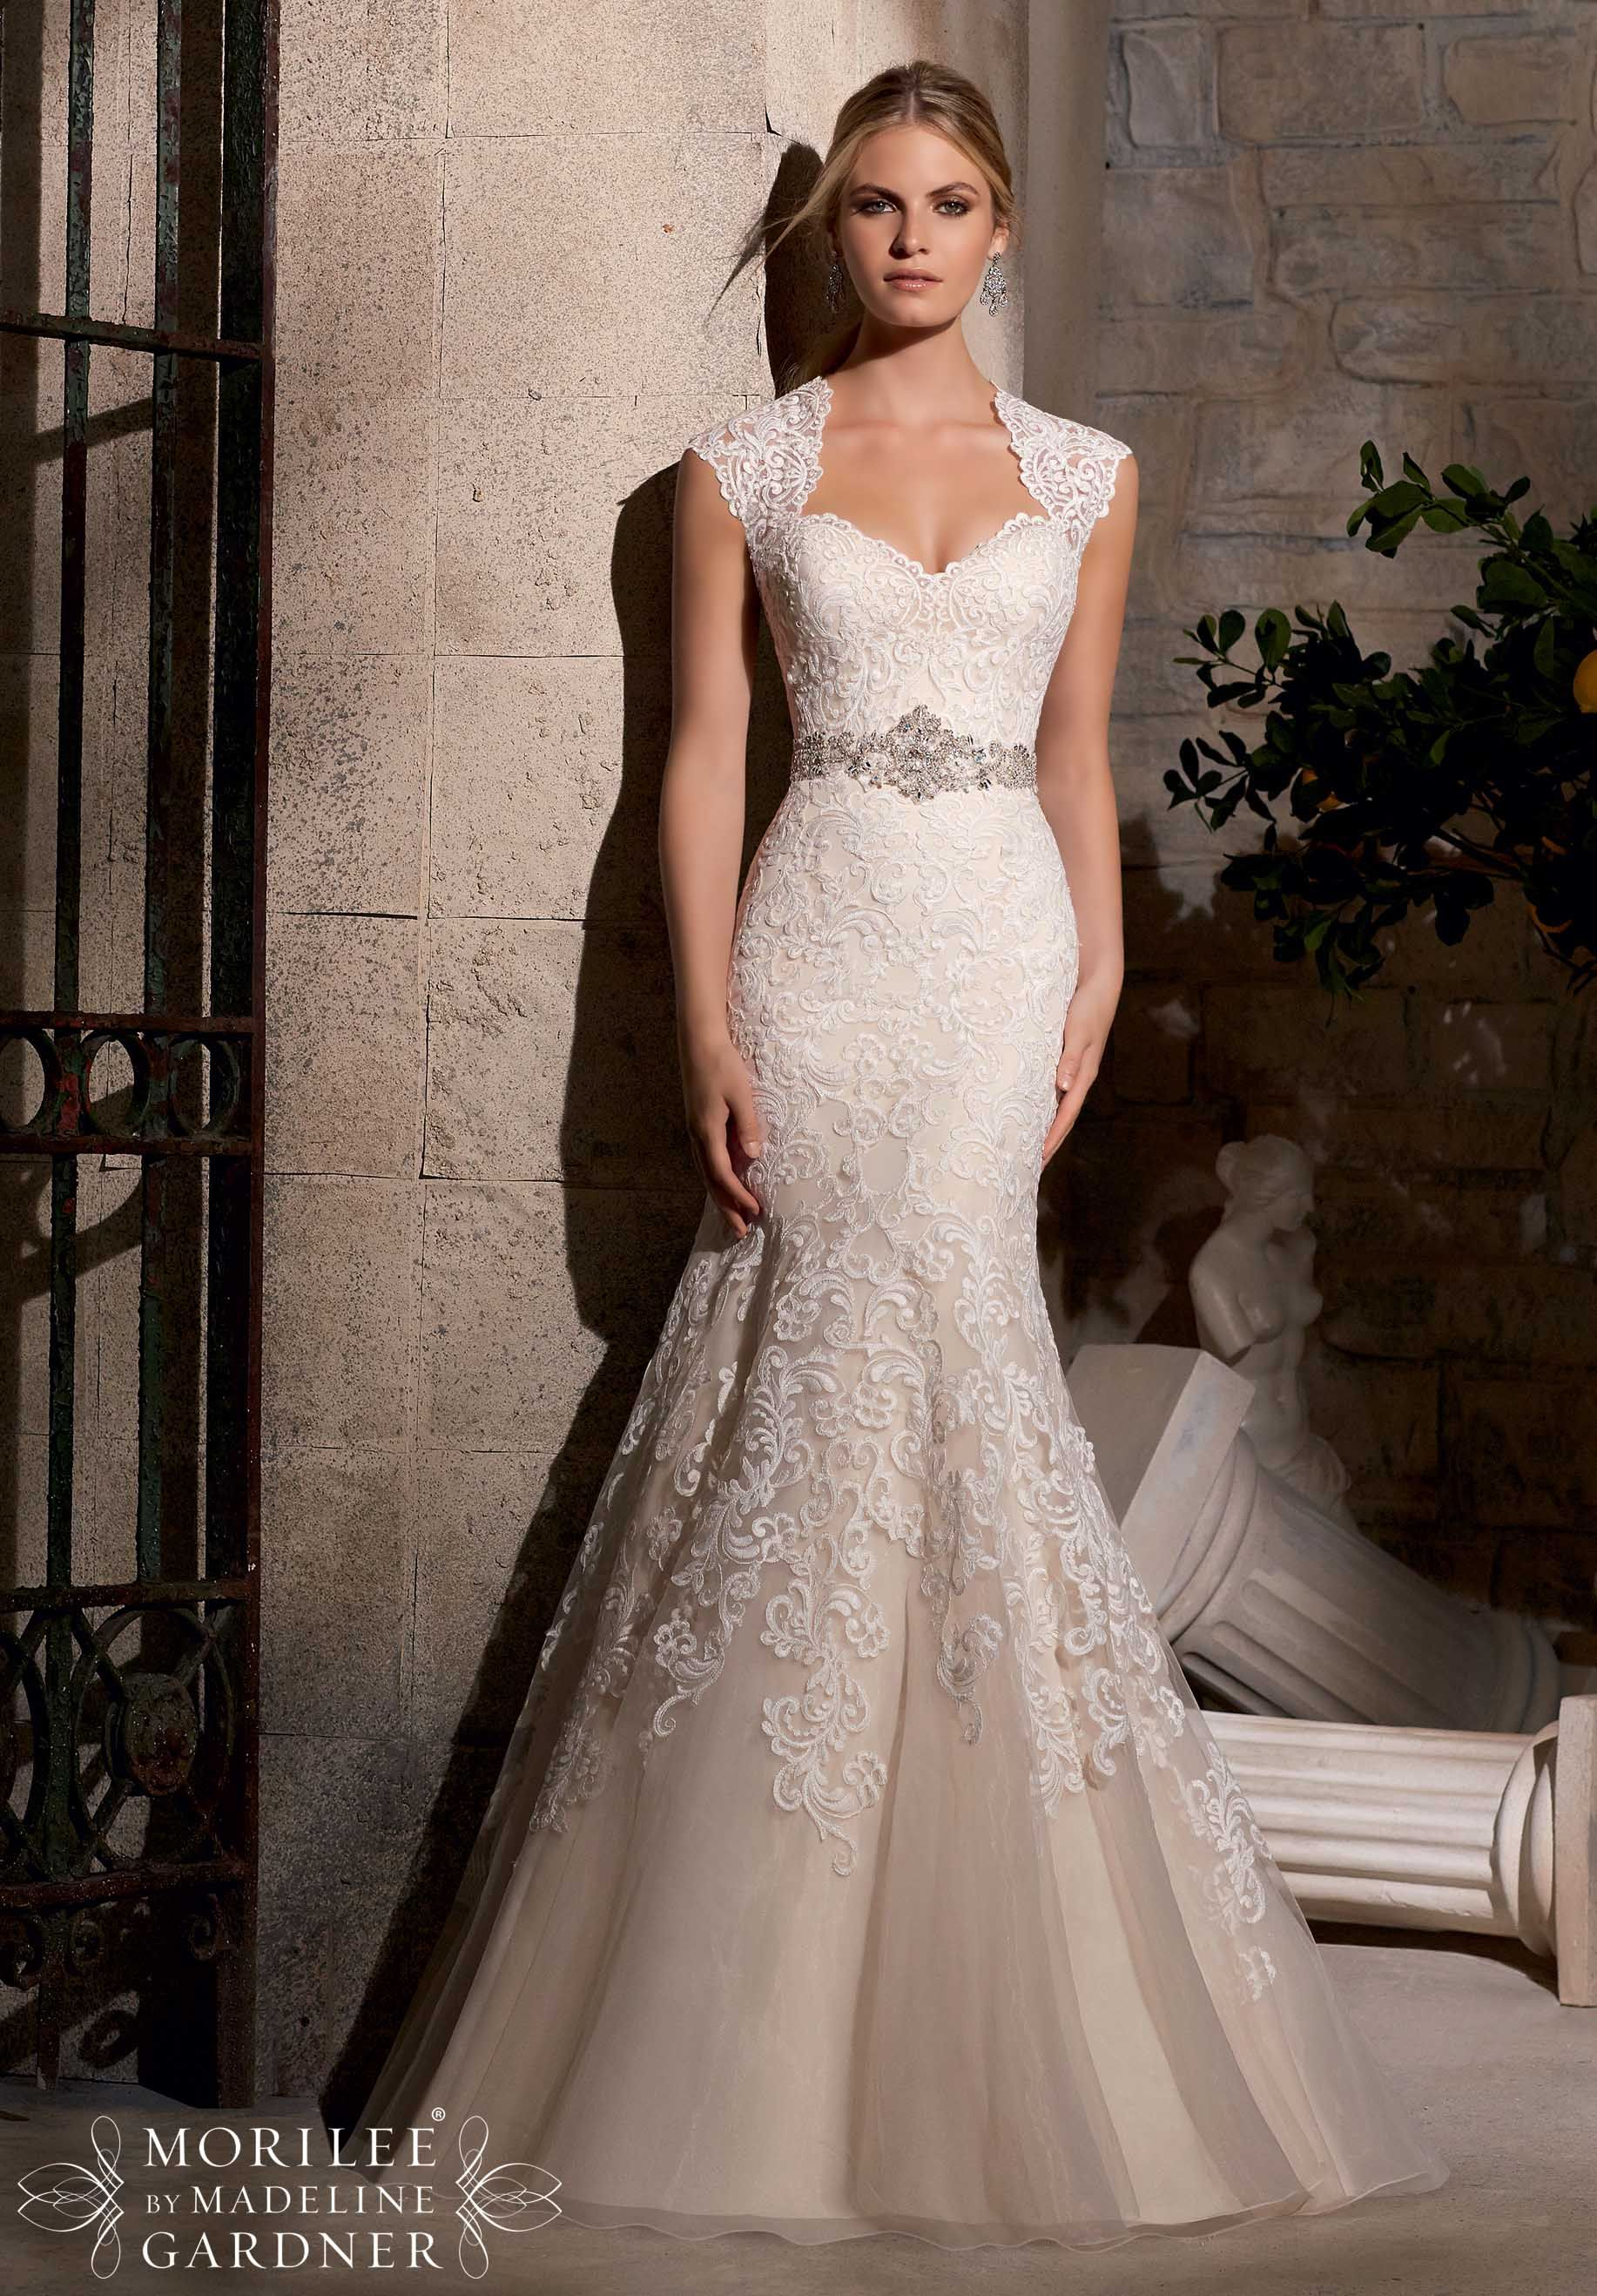 Mori Lee Mori Lee Wedding Dress Wedding Dresses Designer Bridal Gowns